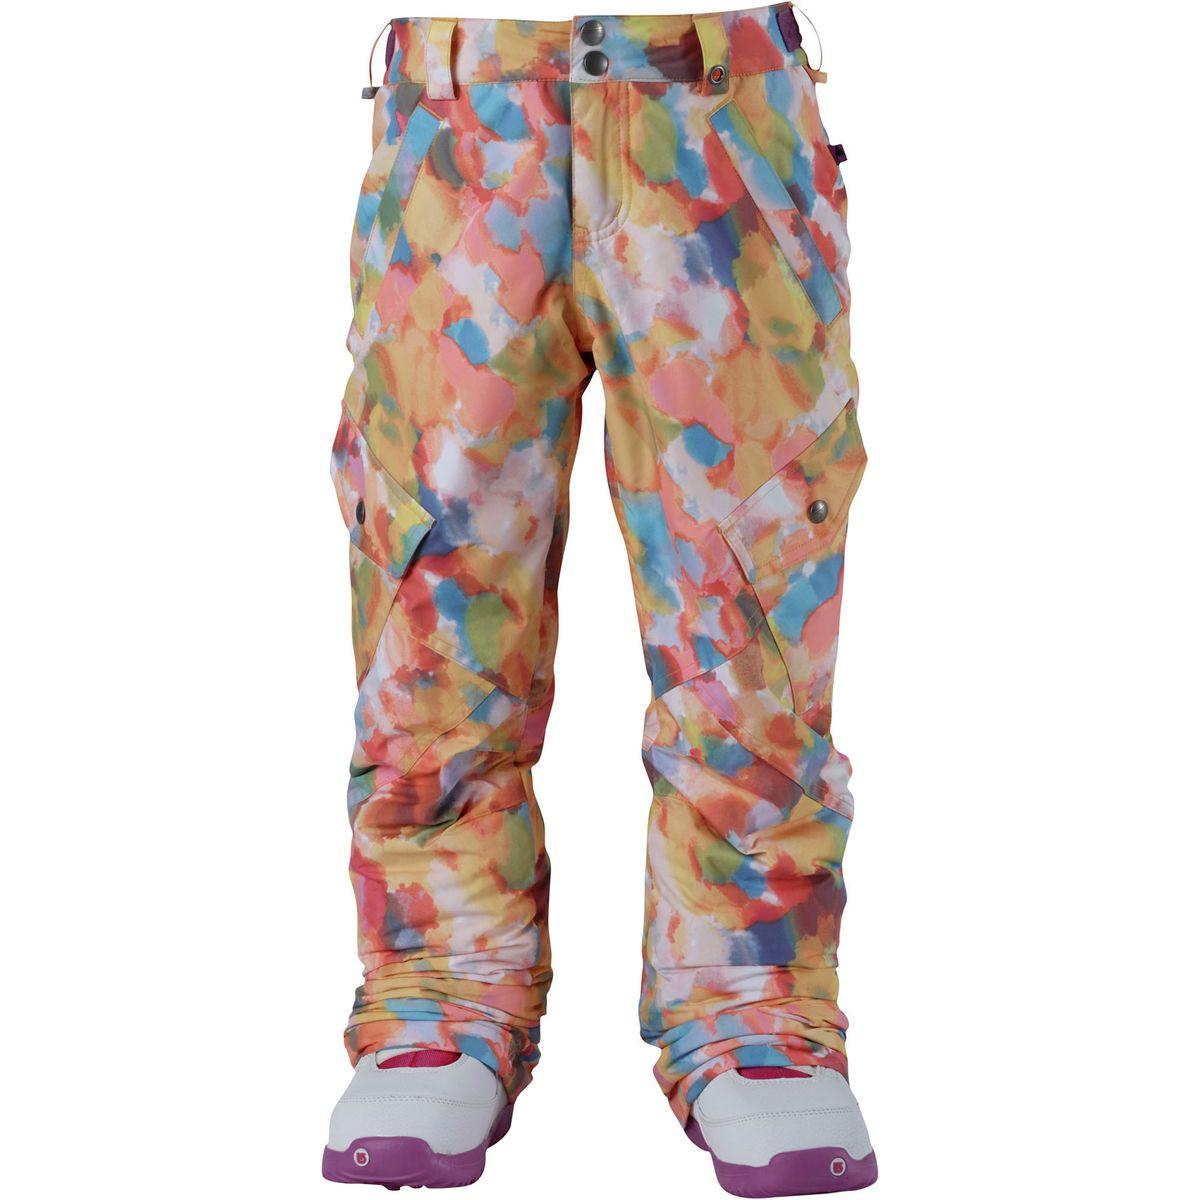 Burton Elite Cargo Pant - Girls